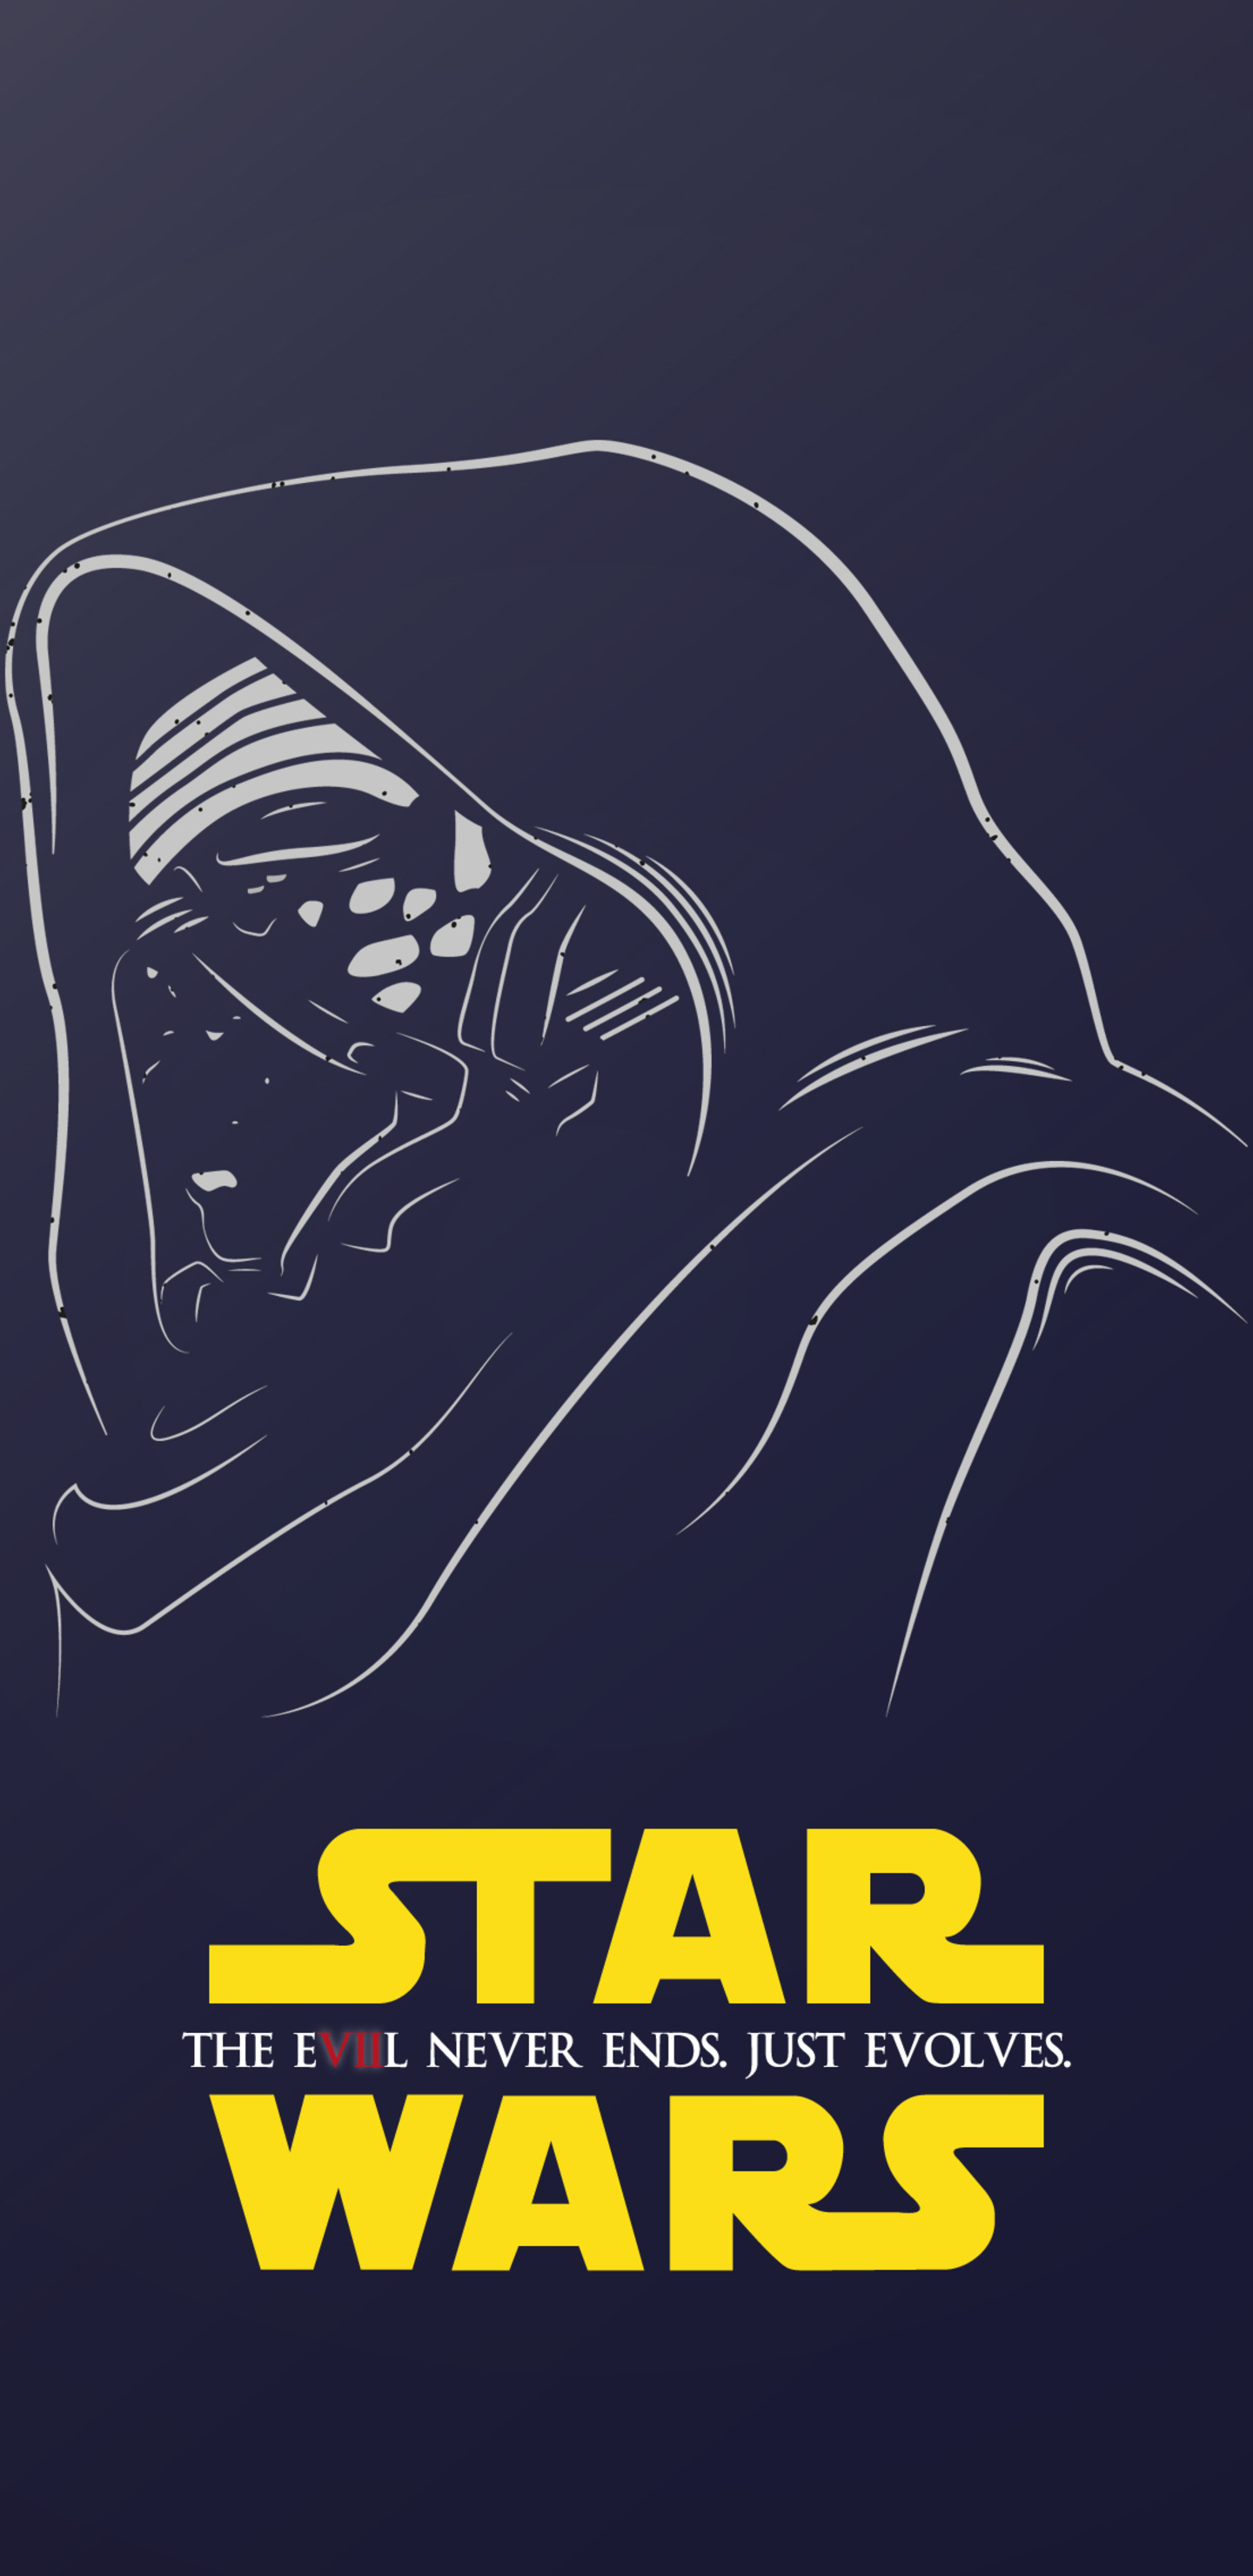 kylo-ren-star-wars-illustration-wf.jpg